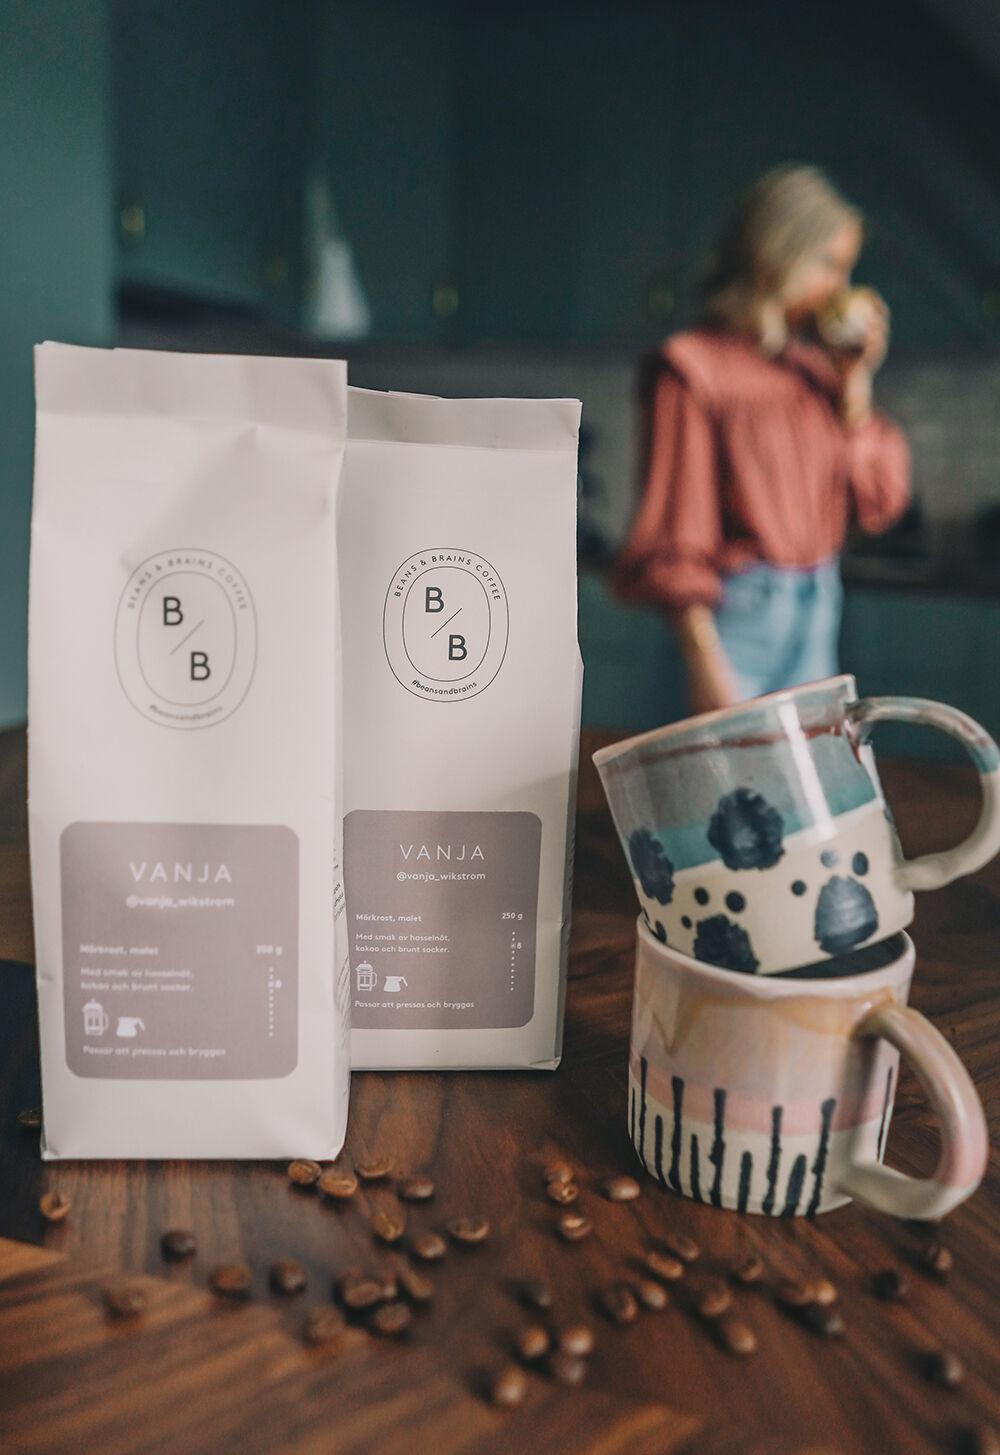 vanja wikström kaffe svanfeldts beans and brains 15